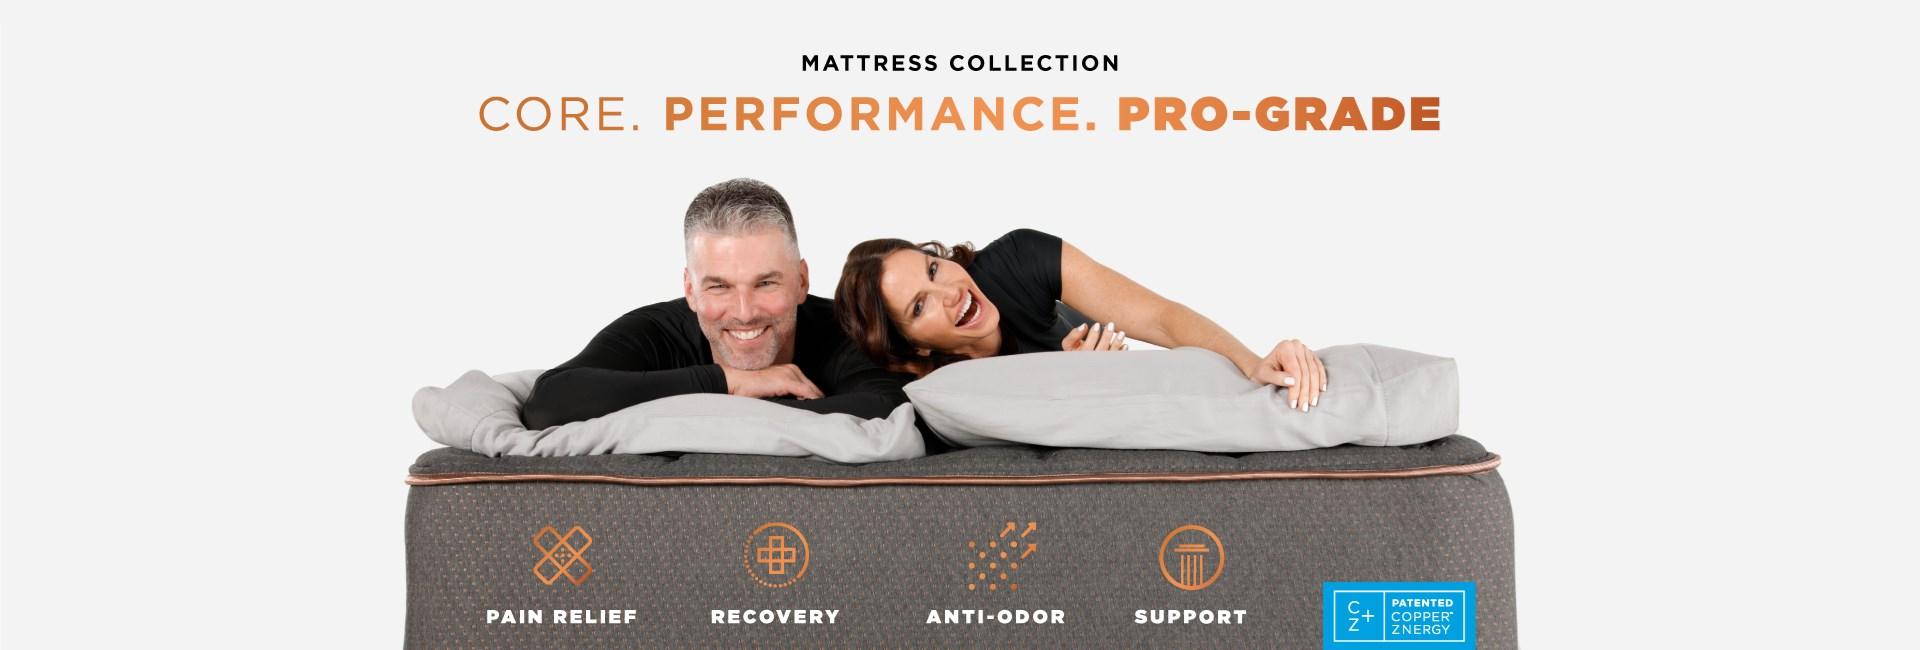 Core Performance Pro-Grade